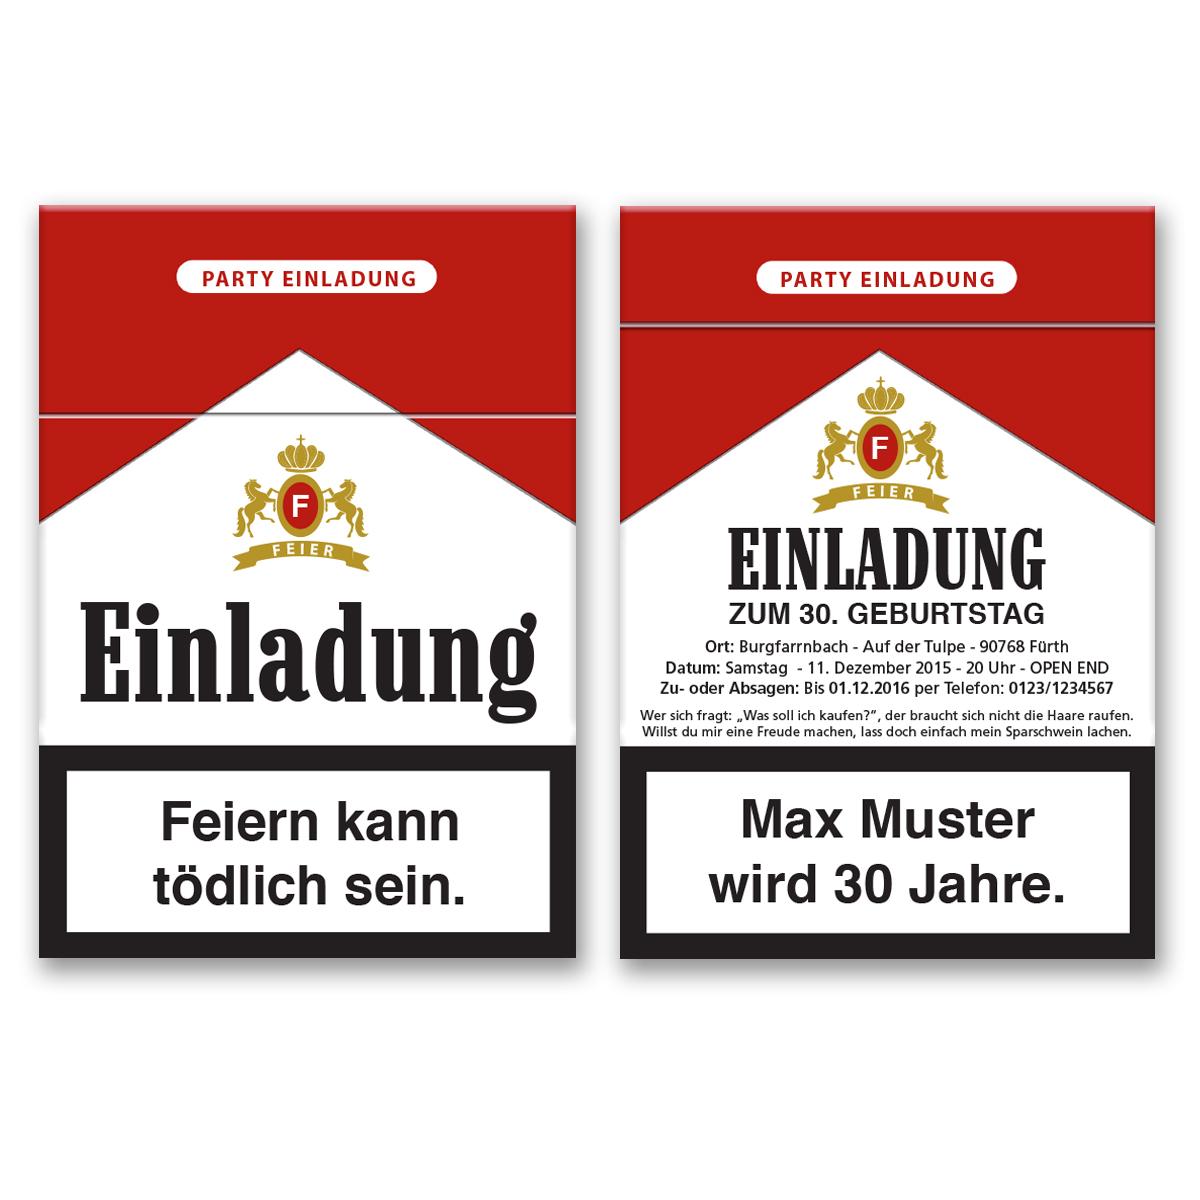 Einladungskarten als Zigarettenschachtel online gestalten